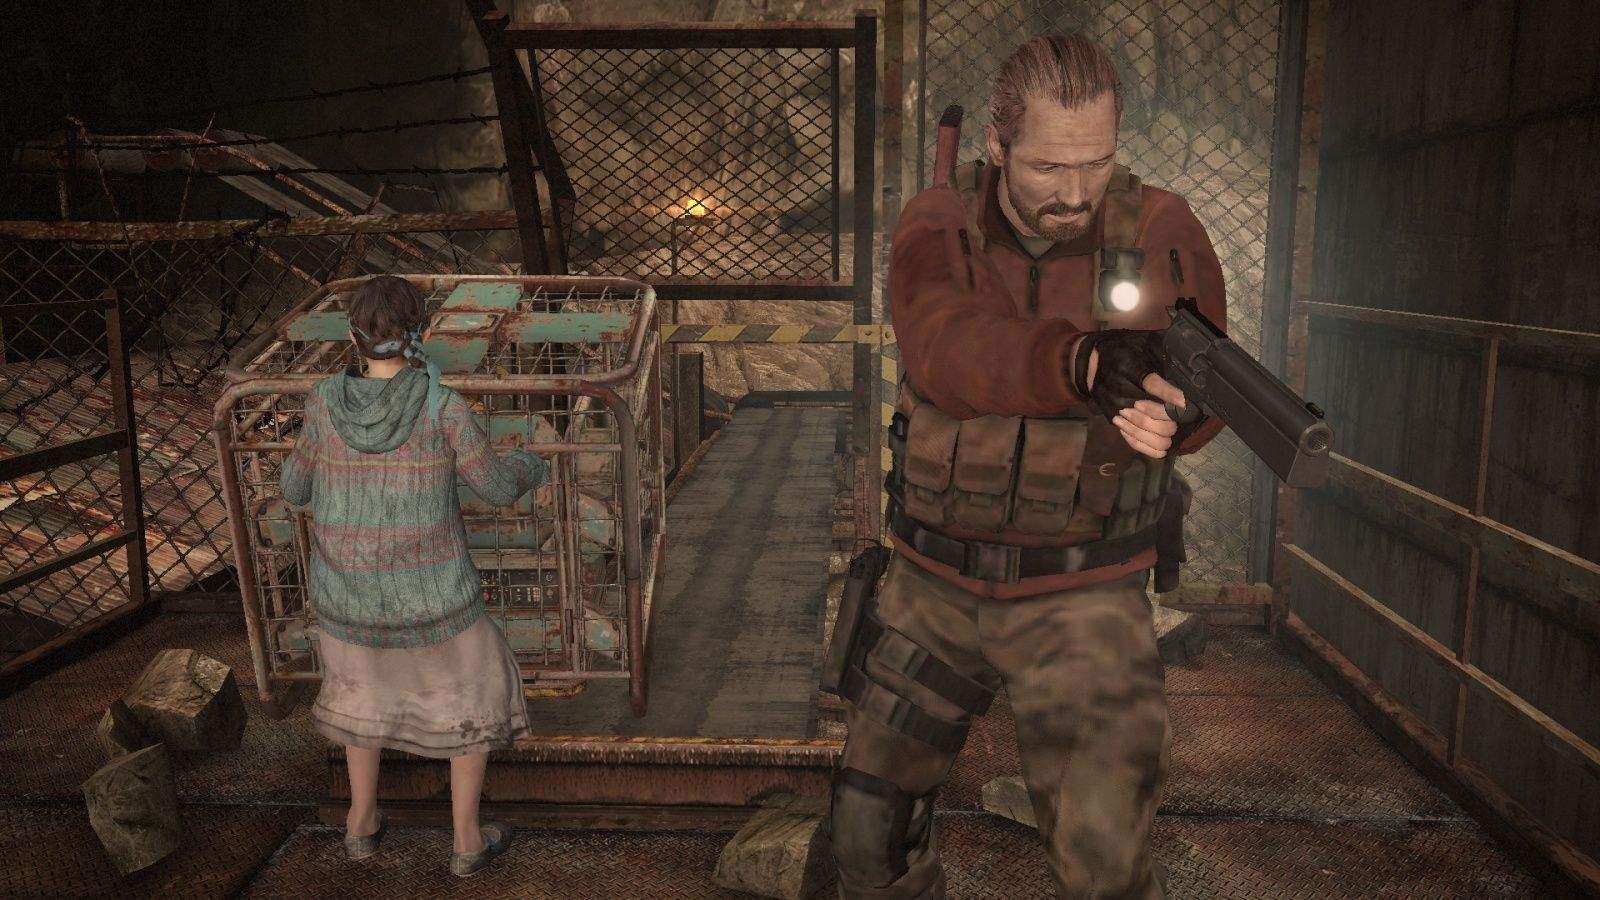 Resident Evil: Revelations 2 squishes action, horror together